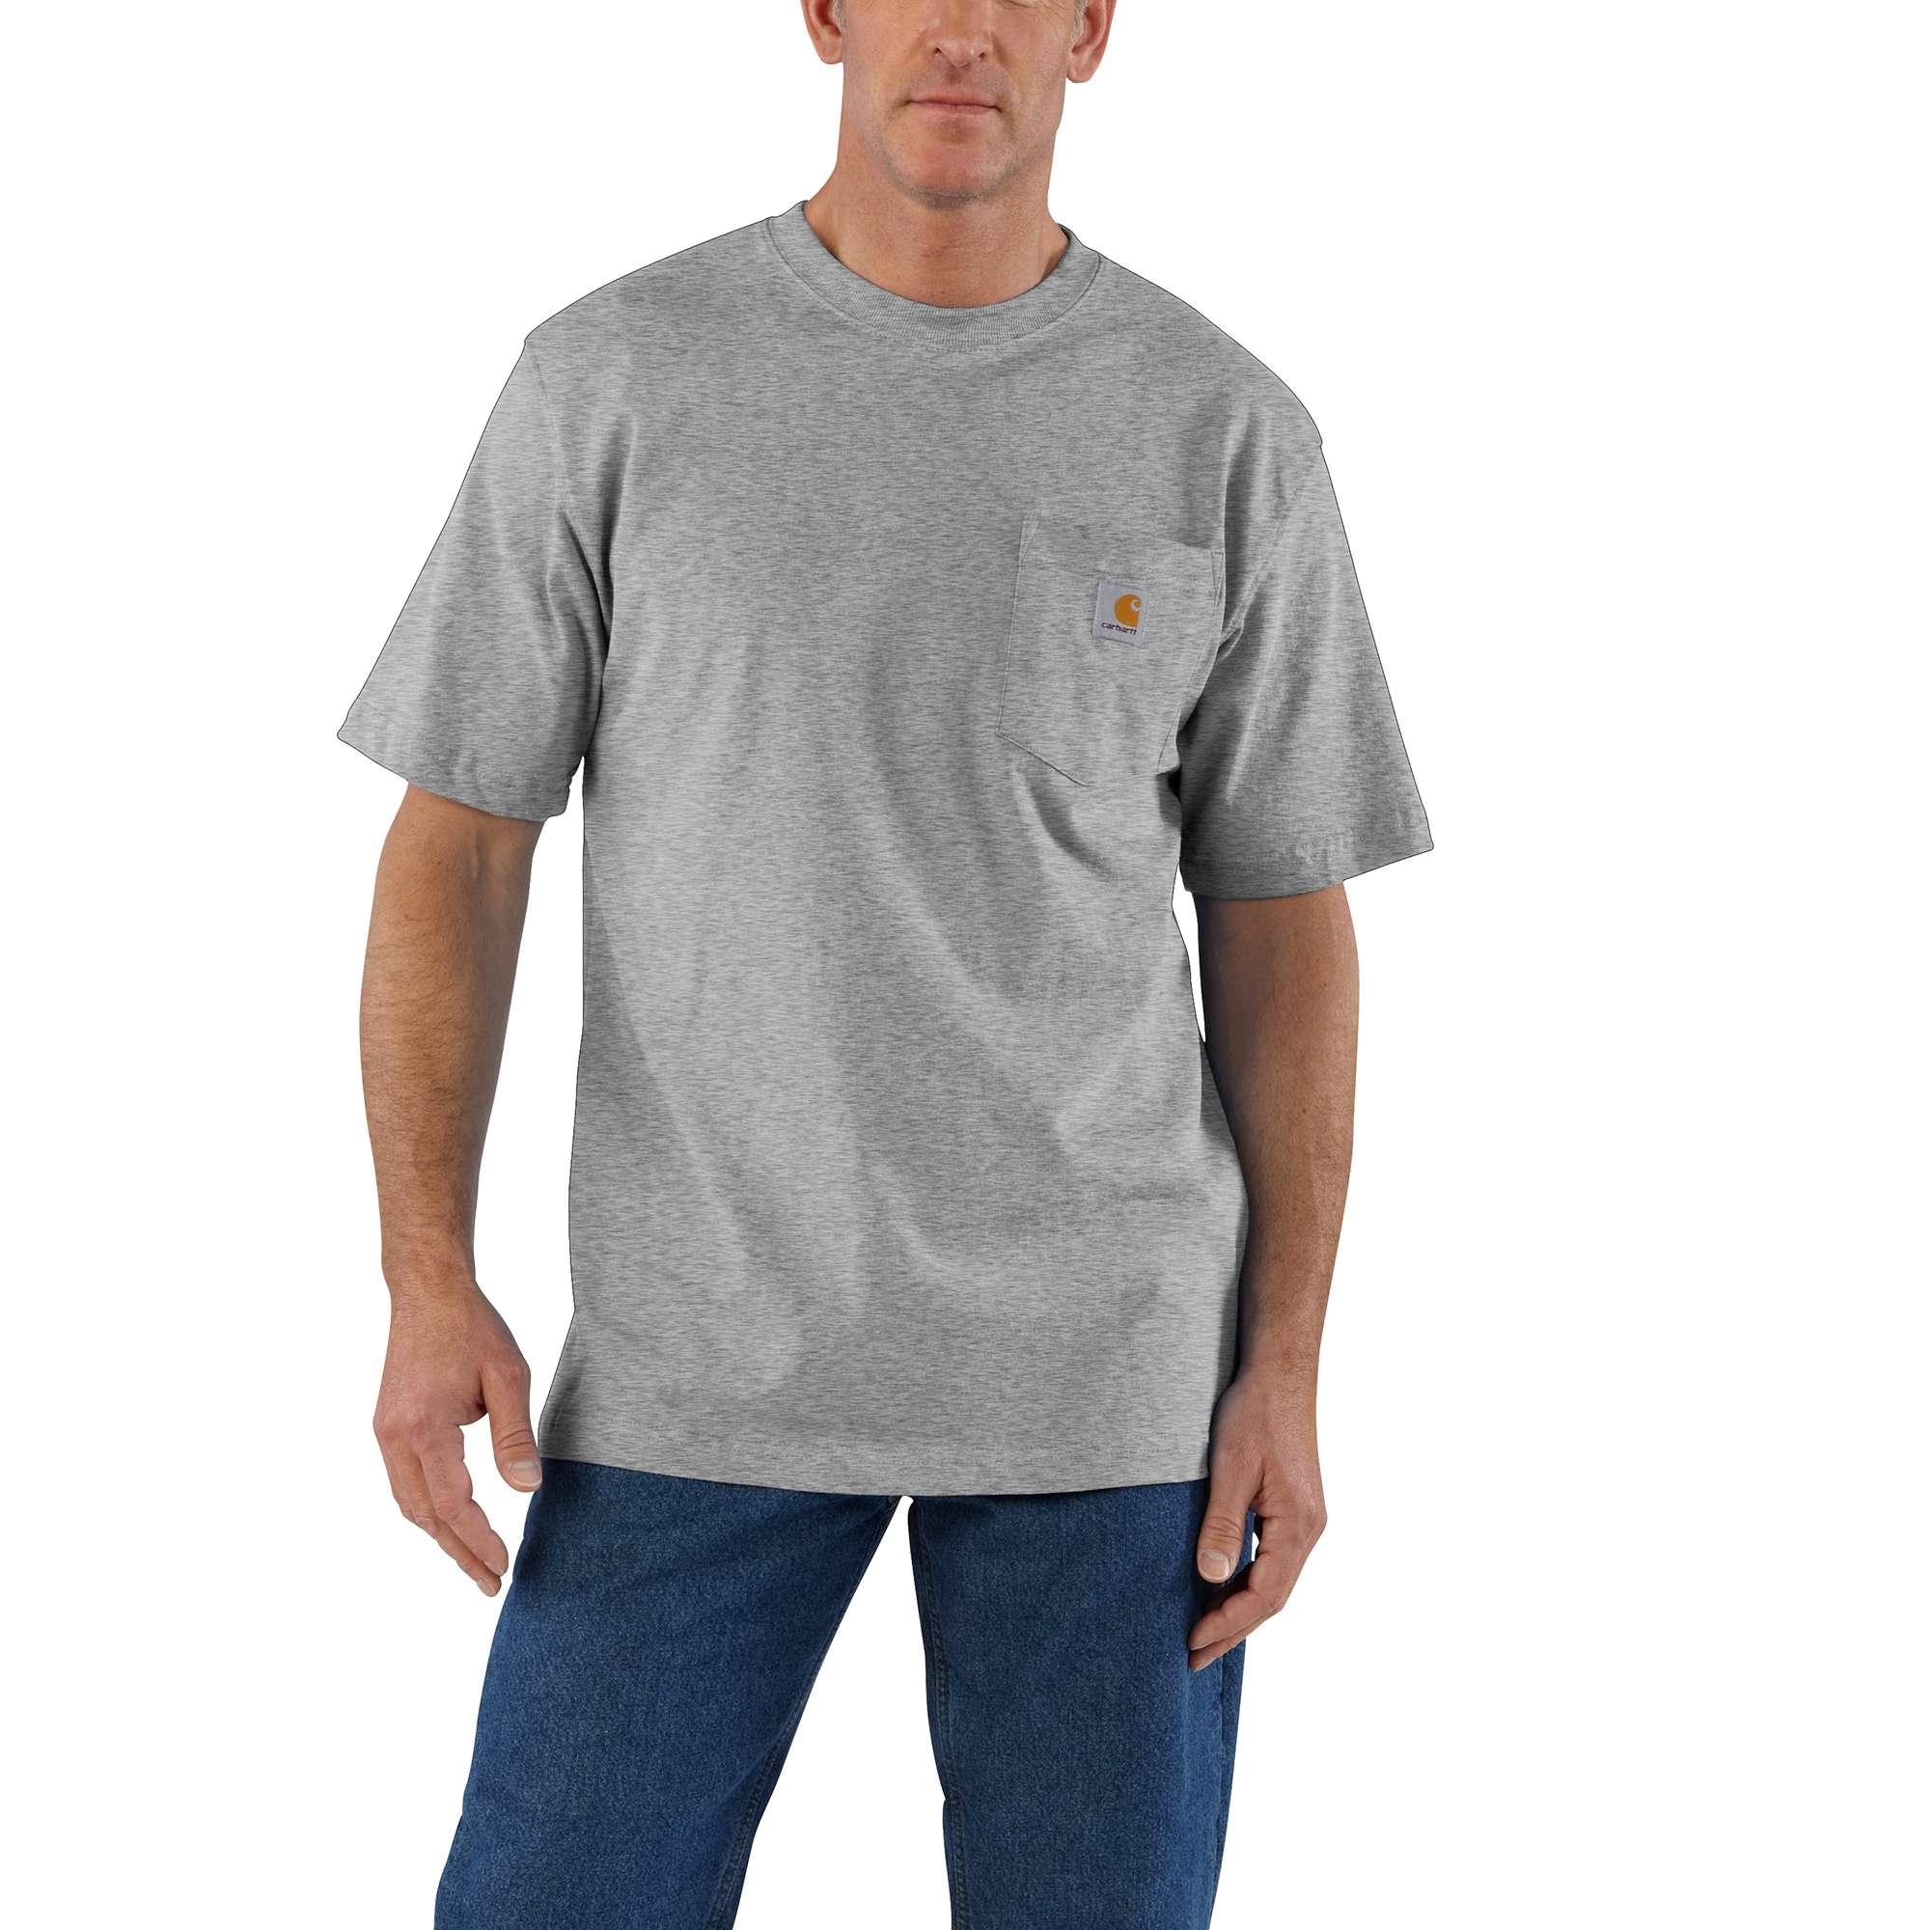 Men's Big & Tall Workwear Pocket T-Shirt, Granite, swatch